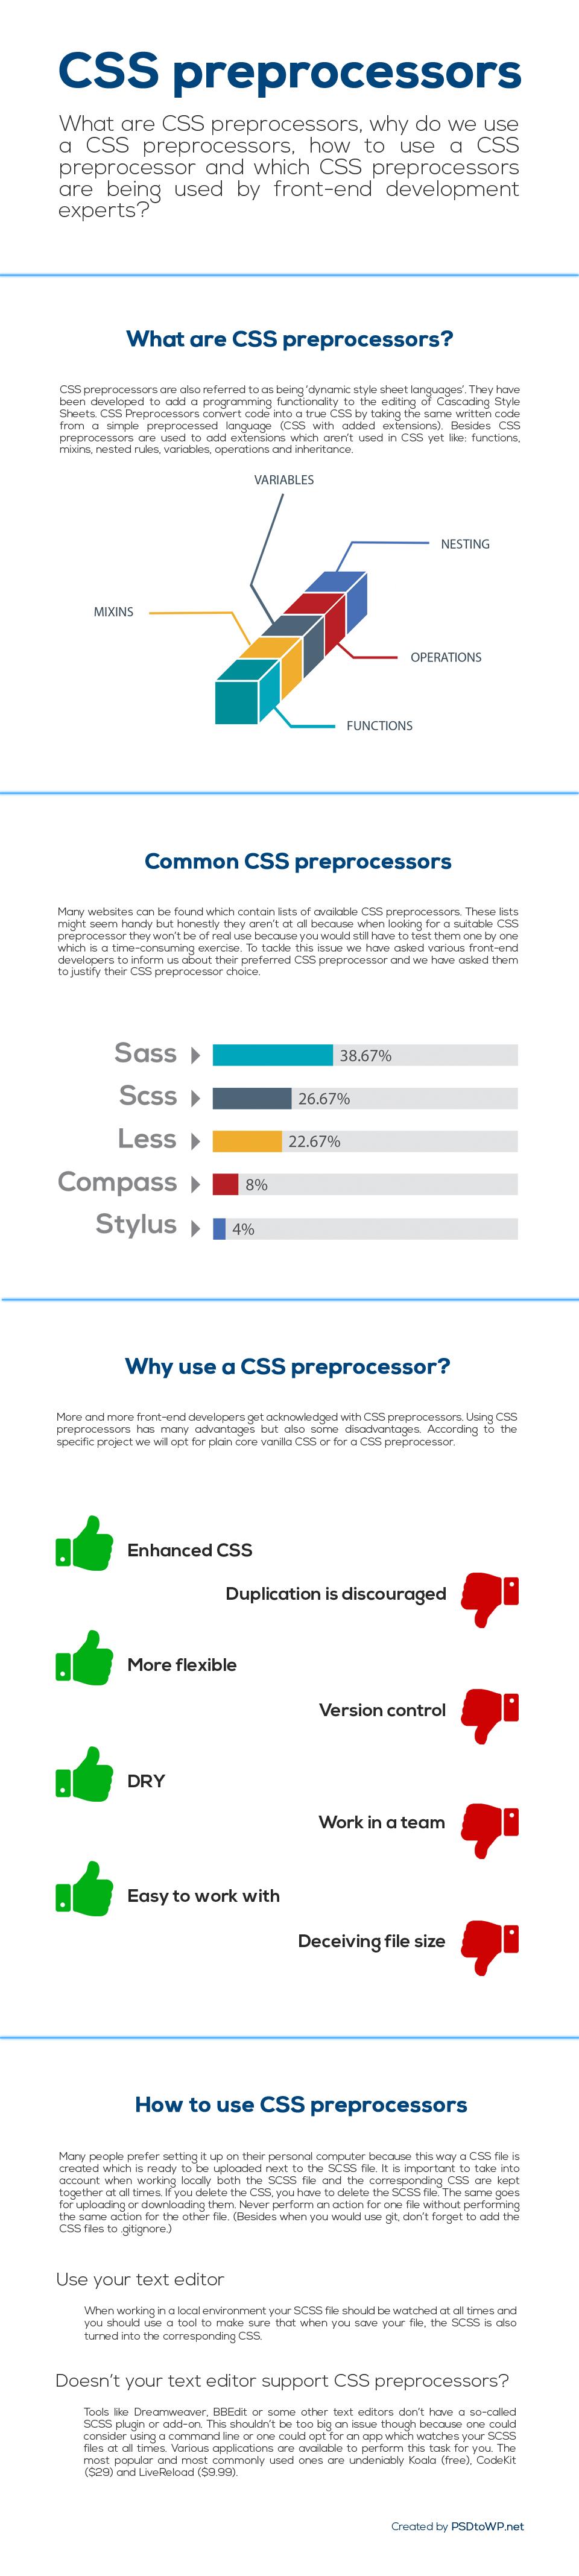 CSS Preprocessors infographic